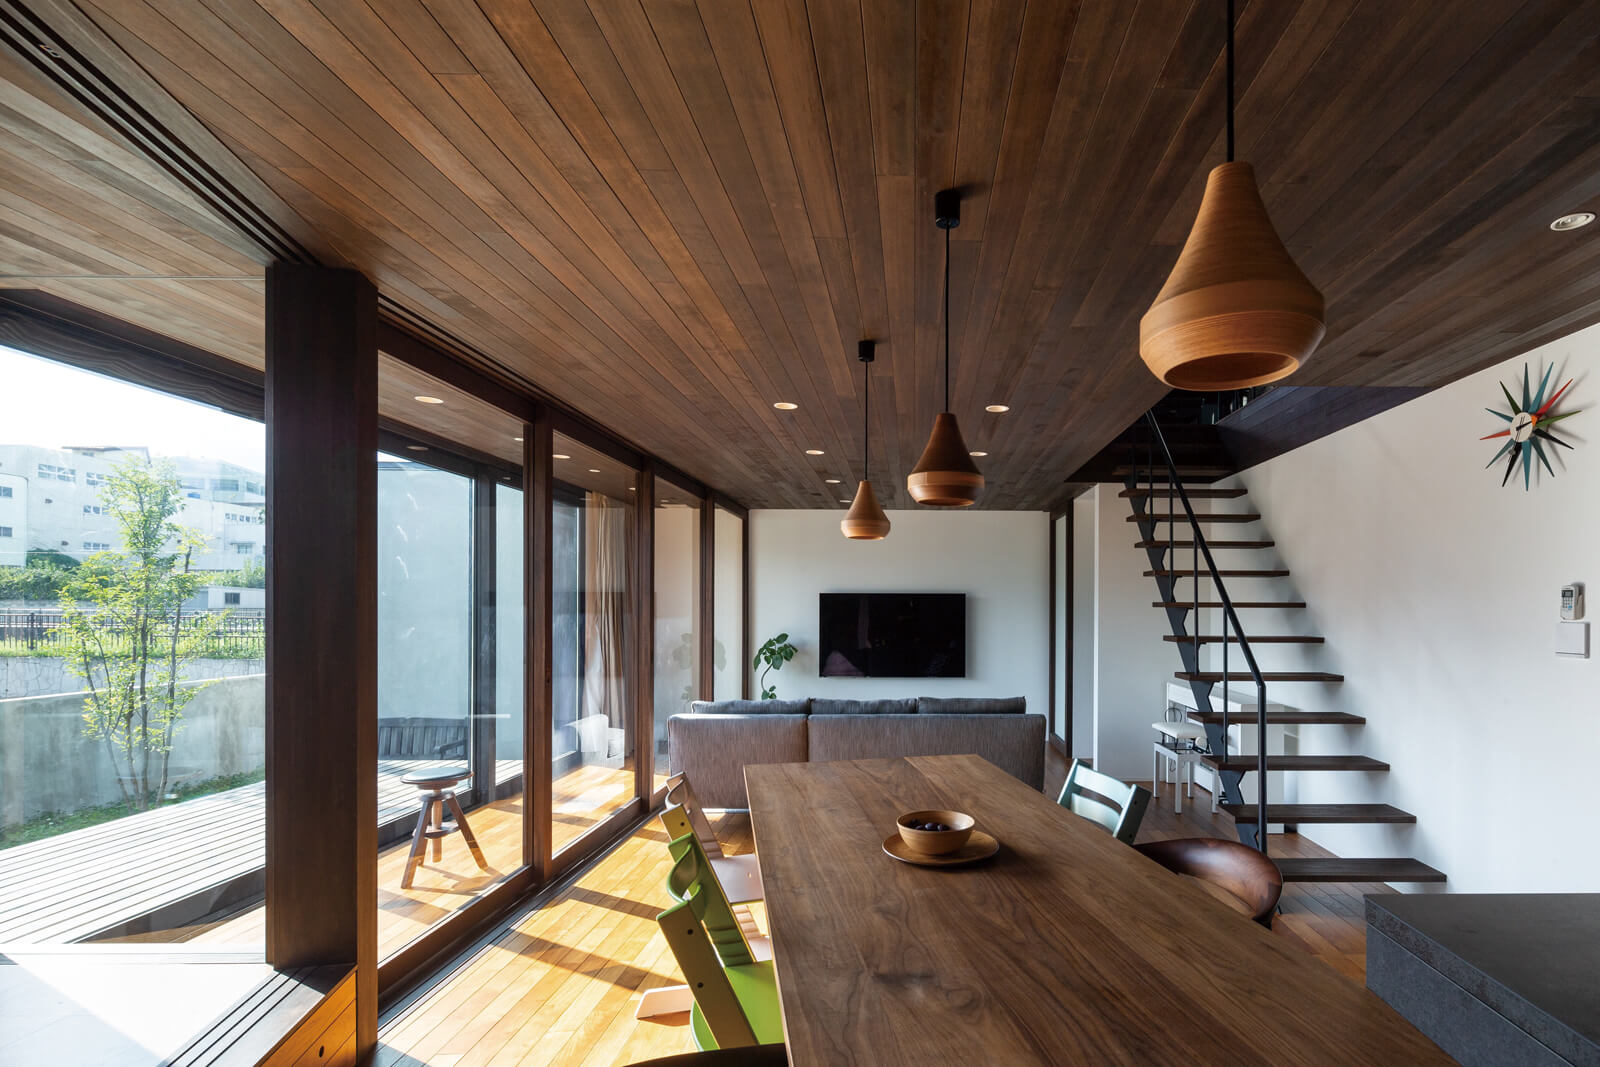 LDK。リビングに面した木製サッシの大開口は、夏冬の室内環境をコントロールするためのサンルームとして住まい手の感覚で開け閉めできる